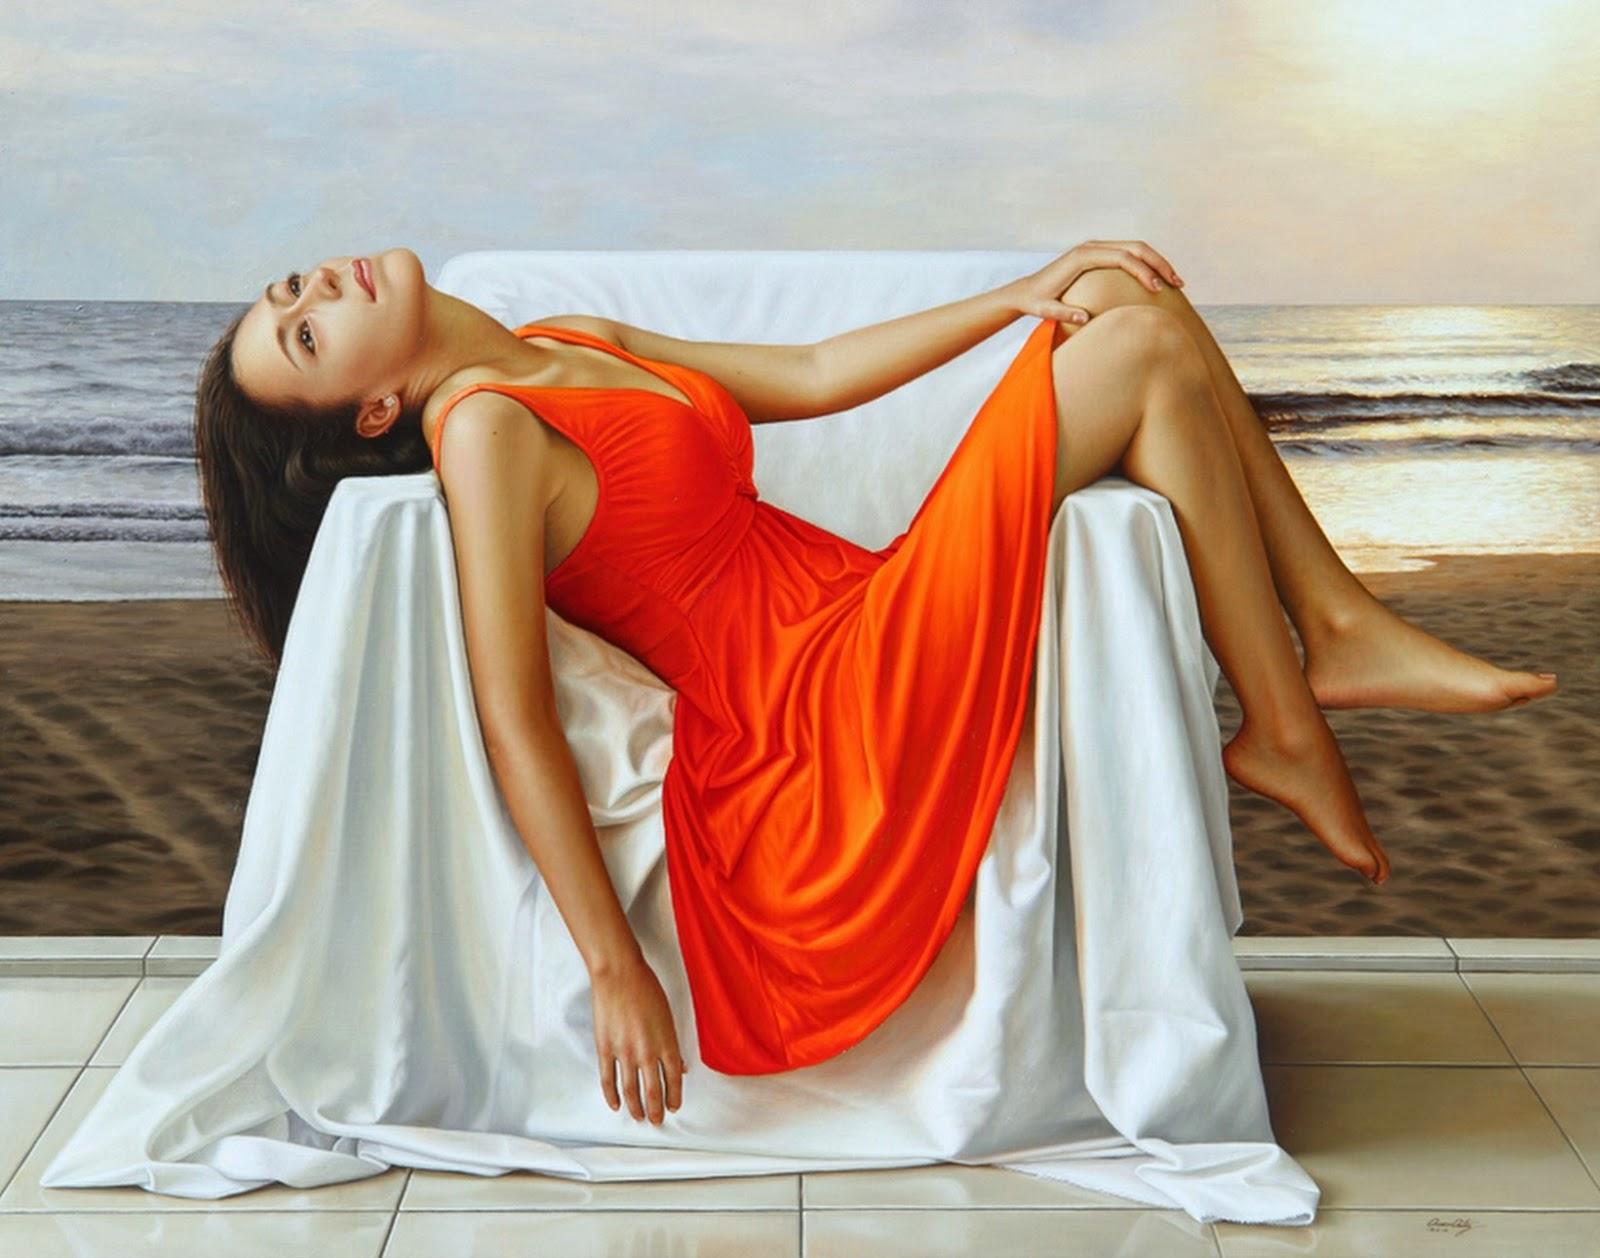 belleza-mexicana-retratos-mujeres